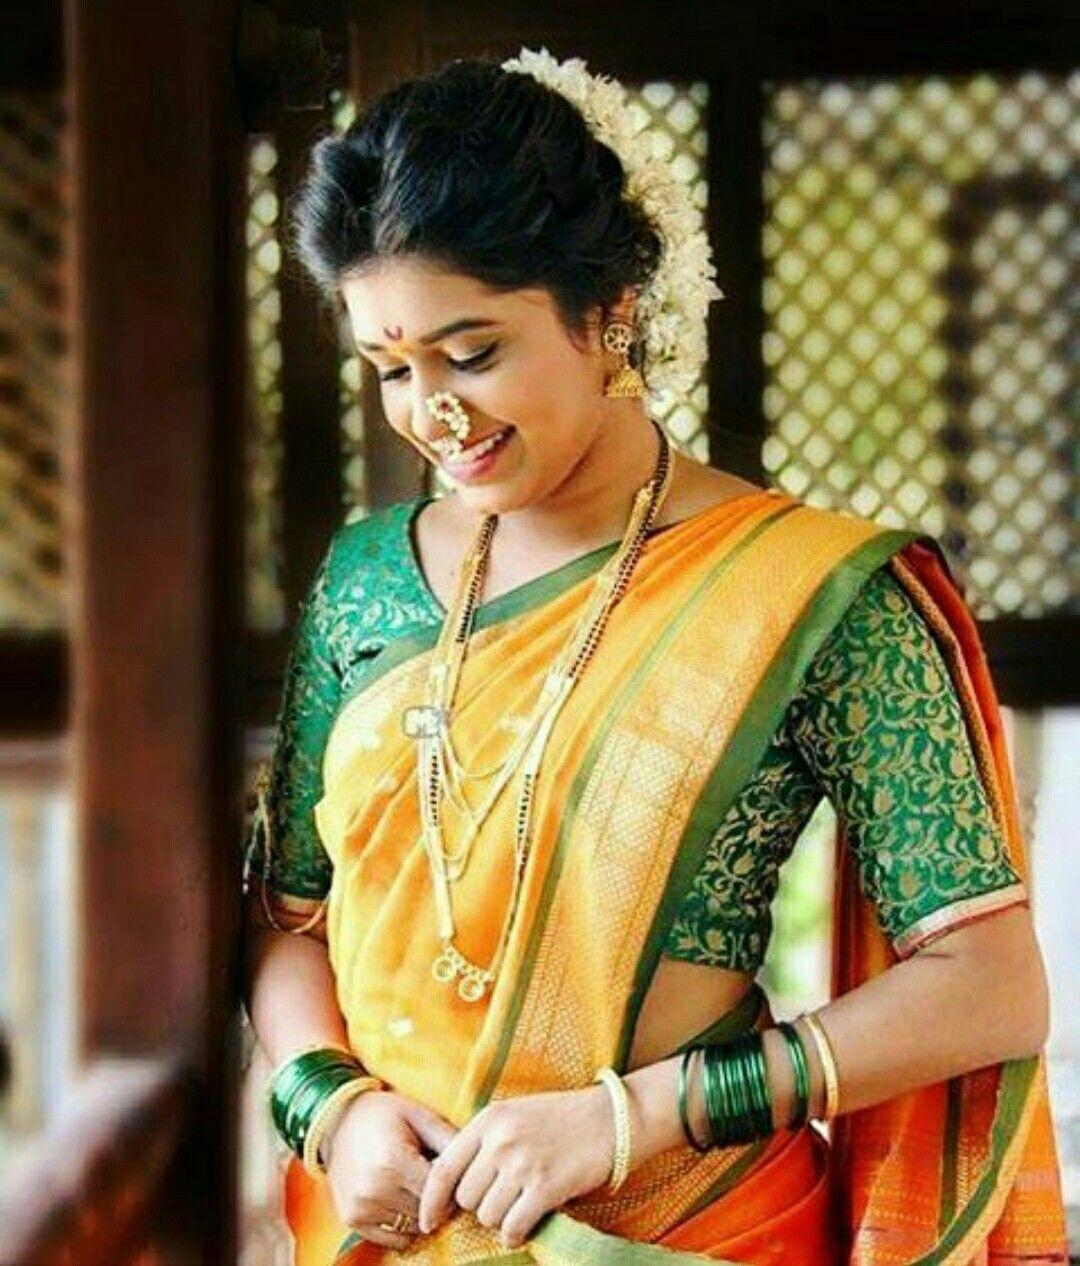 Maharashtrian Bride Hairstyle In 2019 Saree Wedding